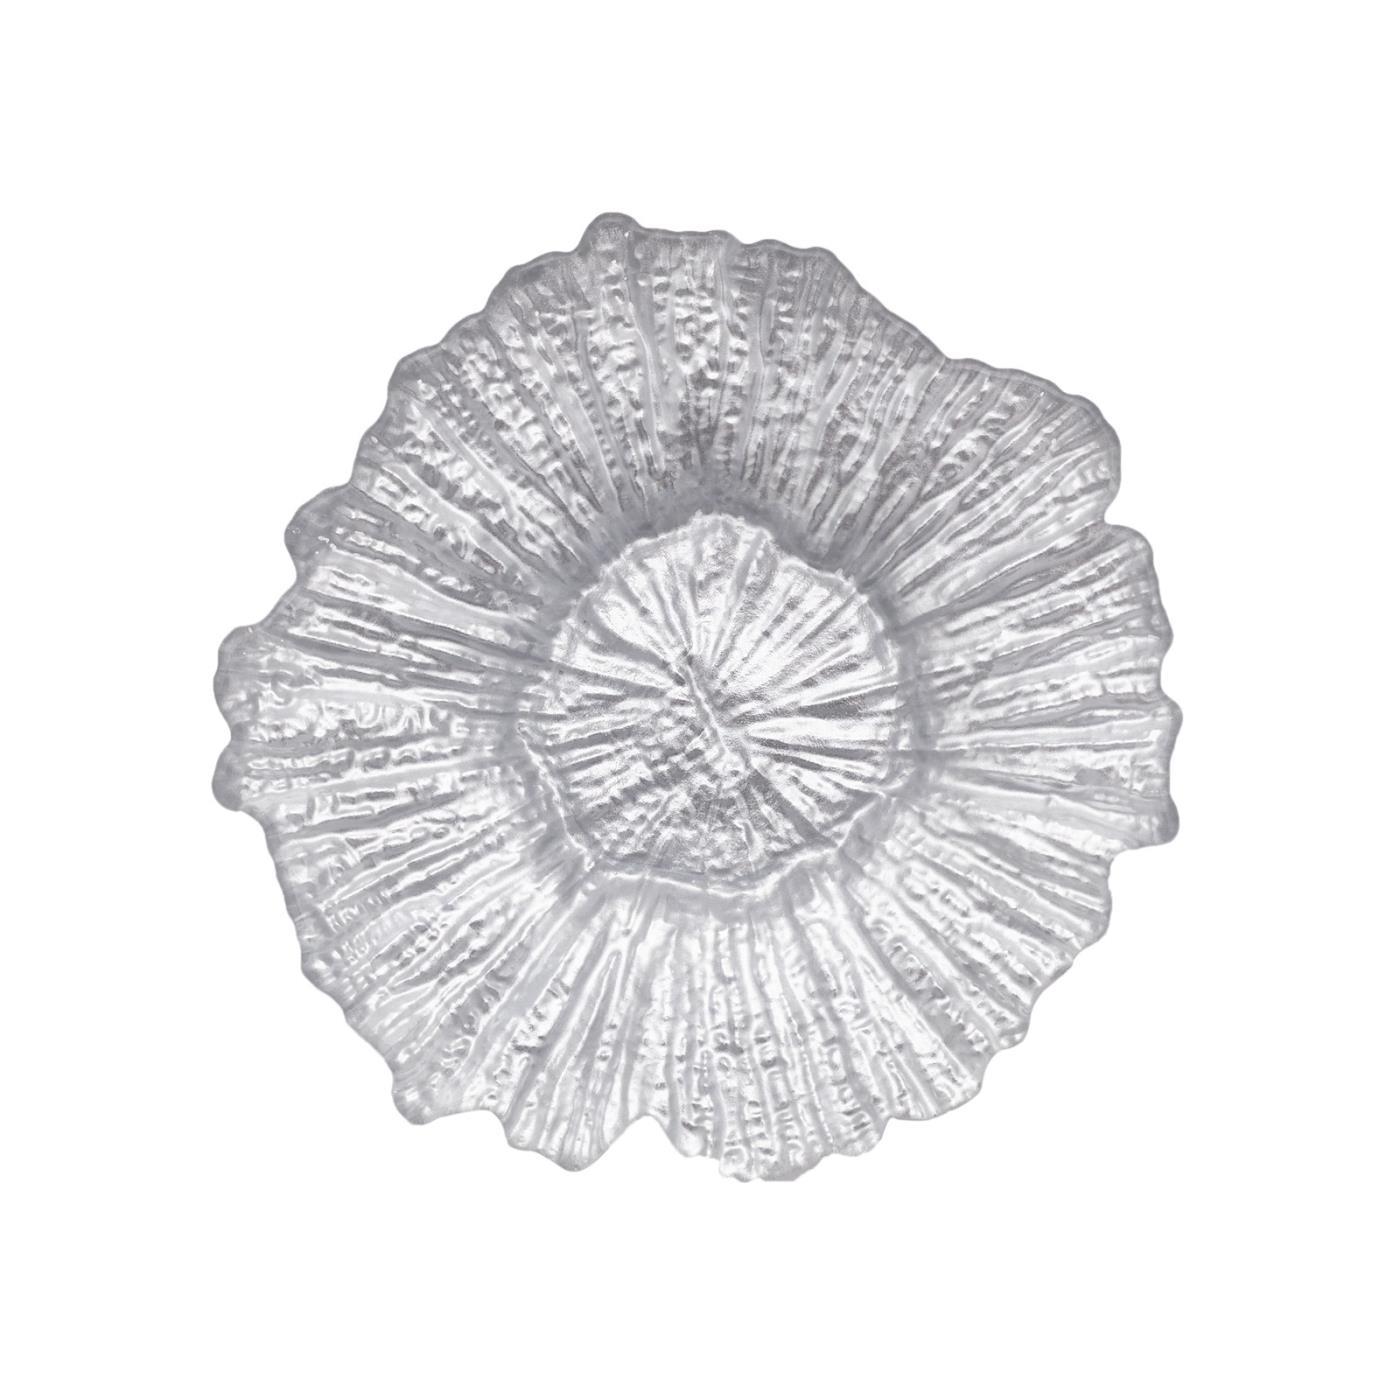 Silver Sea Sponge Glass B&B Plate 6